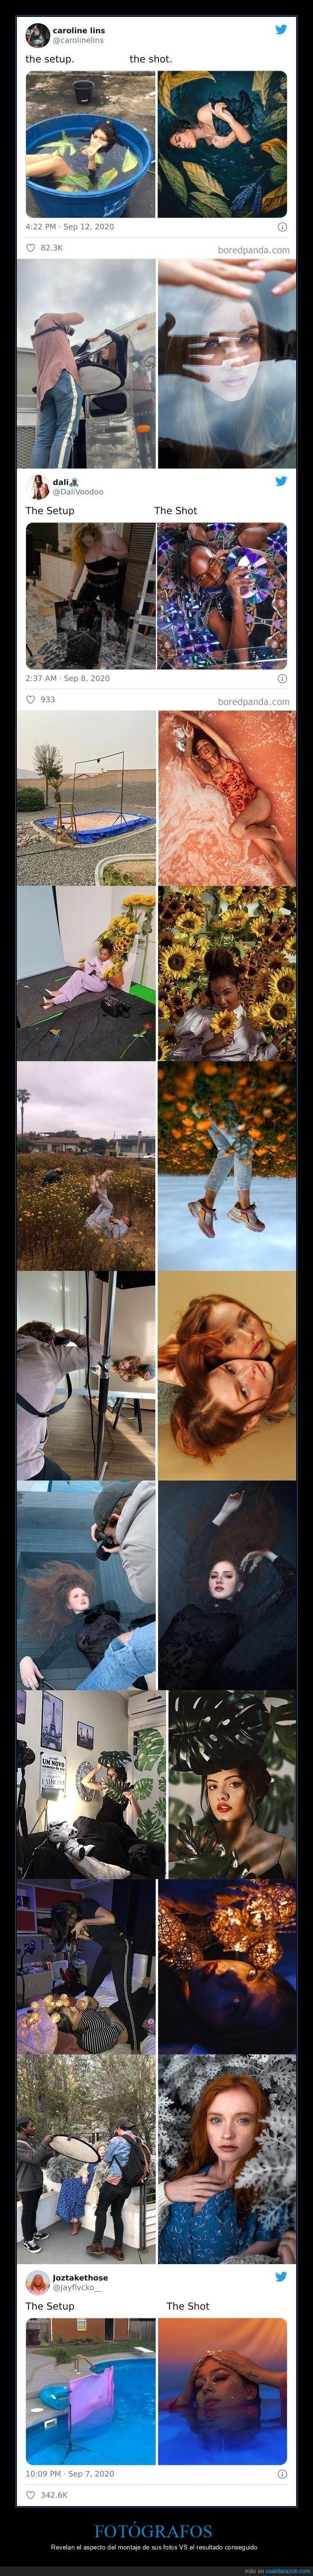 fotografía,fotógrafos,montaje,resultado